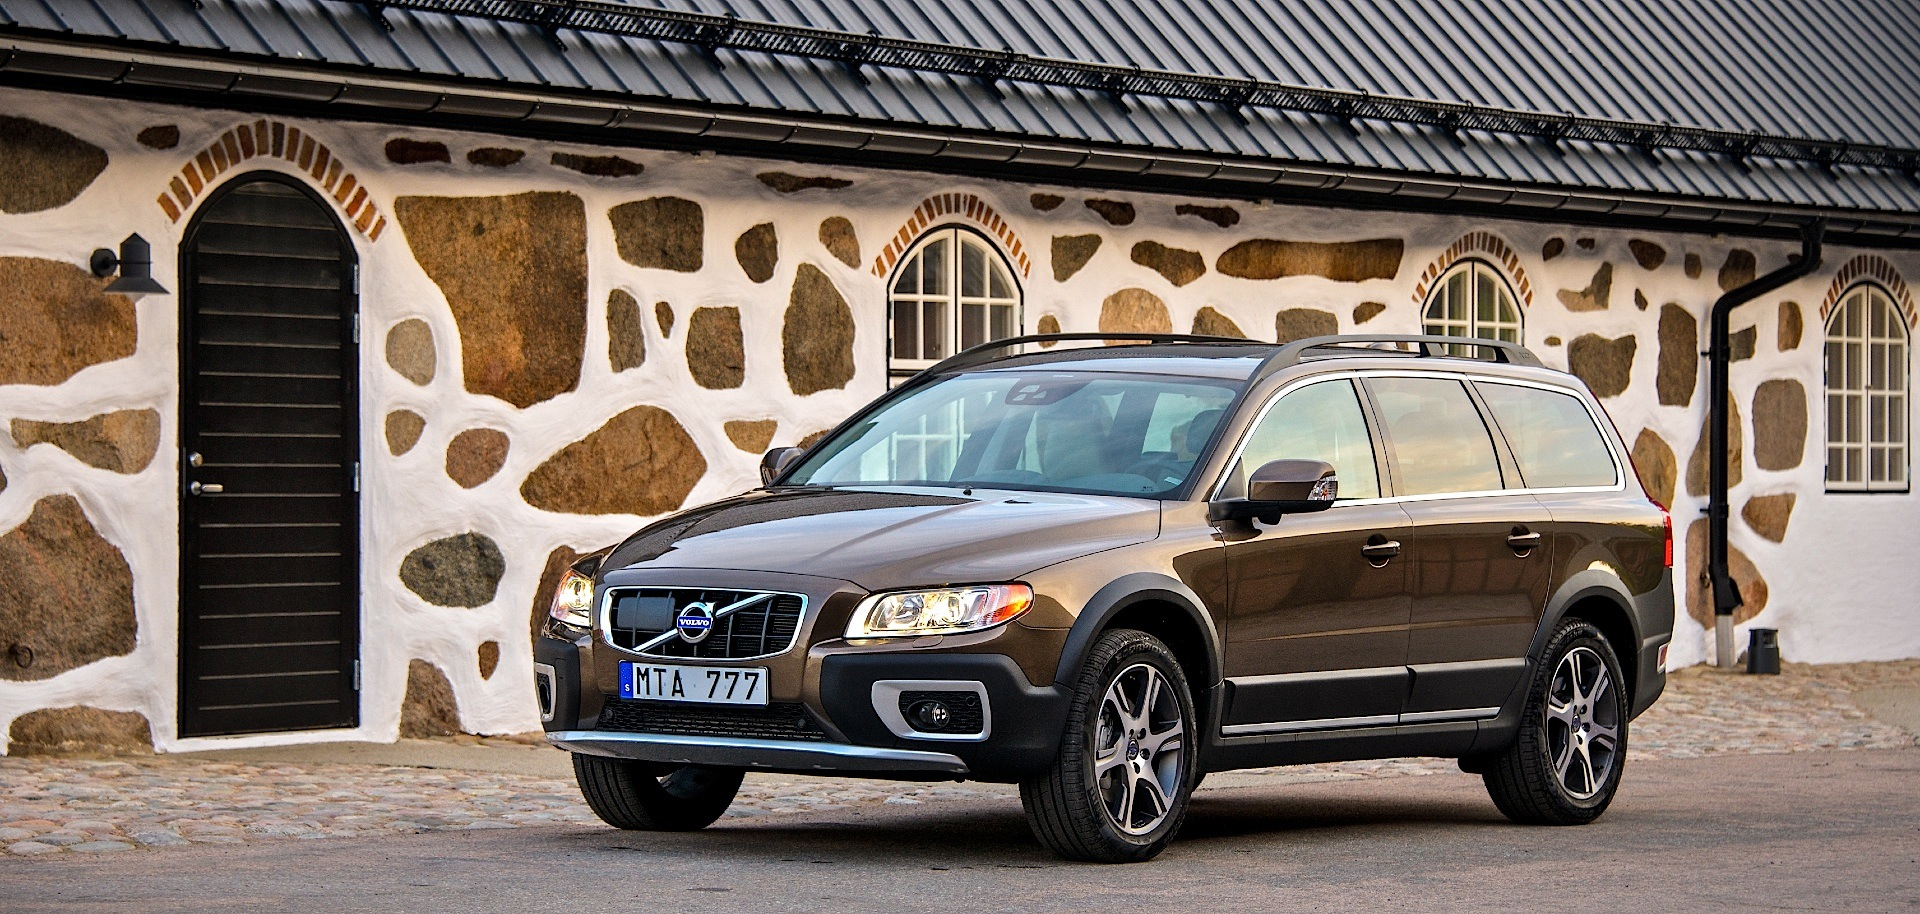 Wagon Car Models 2015 further Volvo V90 Cross Country Ersattaren Till Xc70 175771 as well Showthread also 14848 Volvo Xc70 Samu additionally Engine. on 2015 volvo xc70 awd